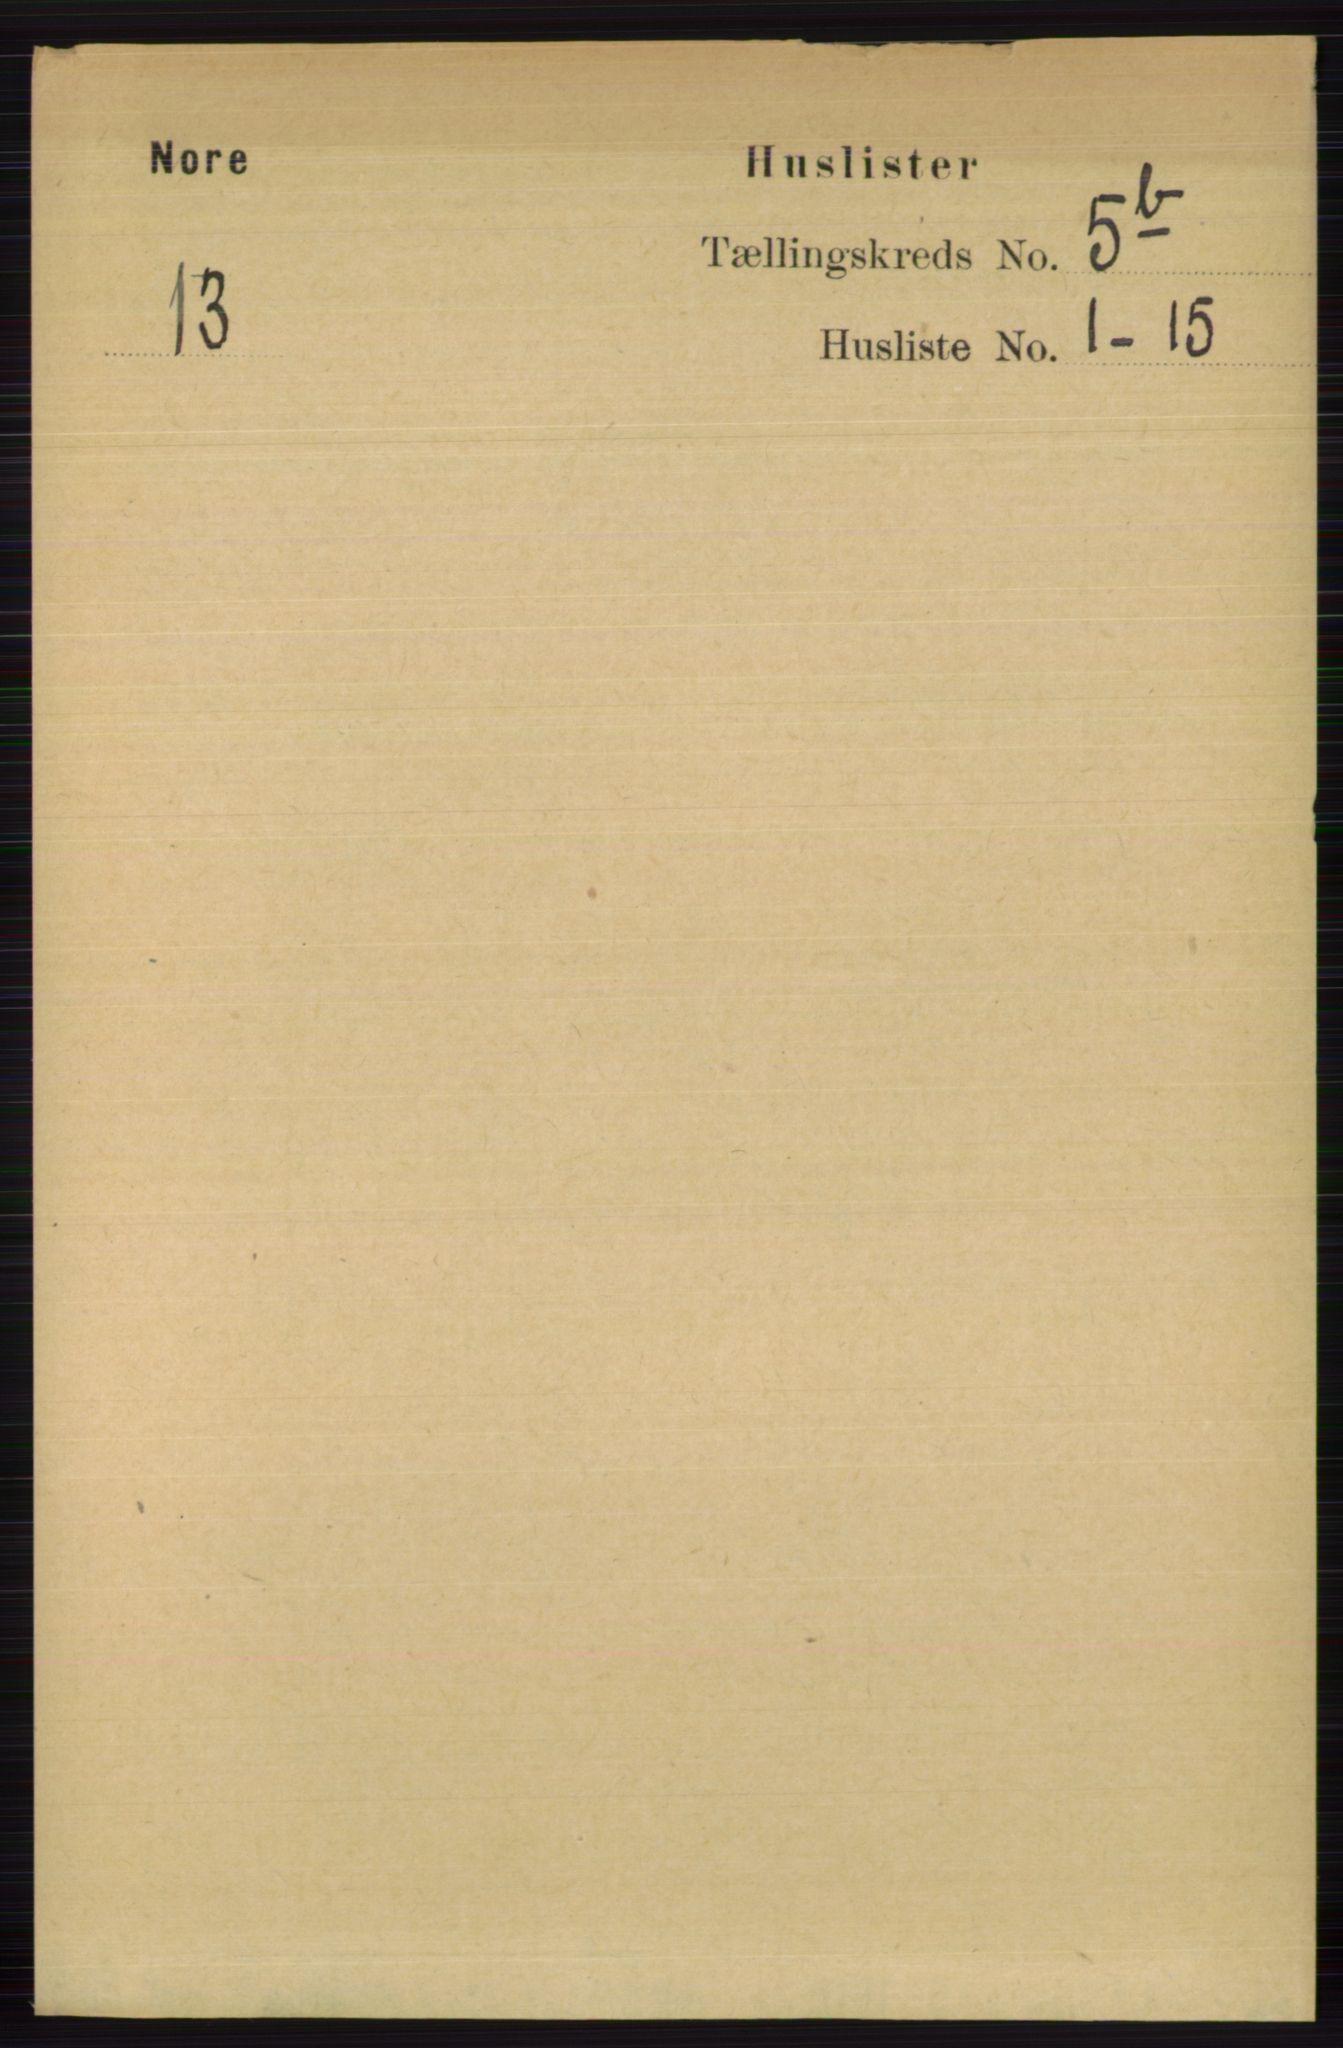 RA, Folketelling 1891 for 0633 Nore herred, 1891, s. 1760